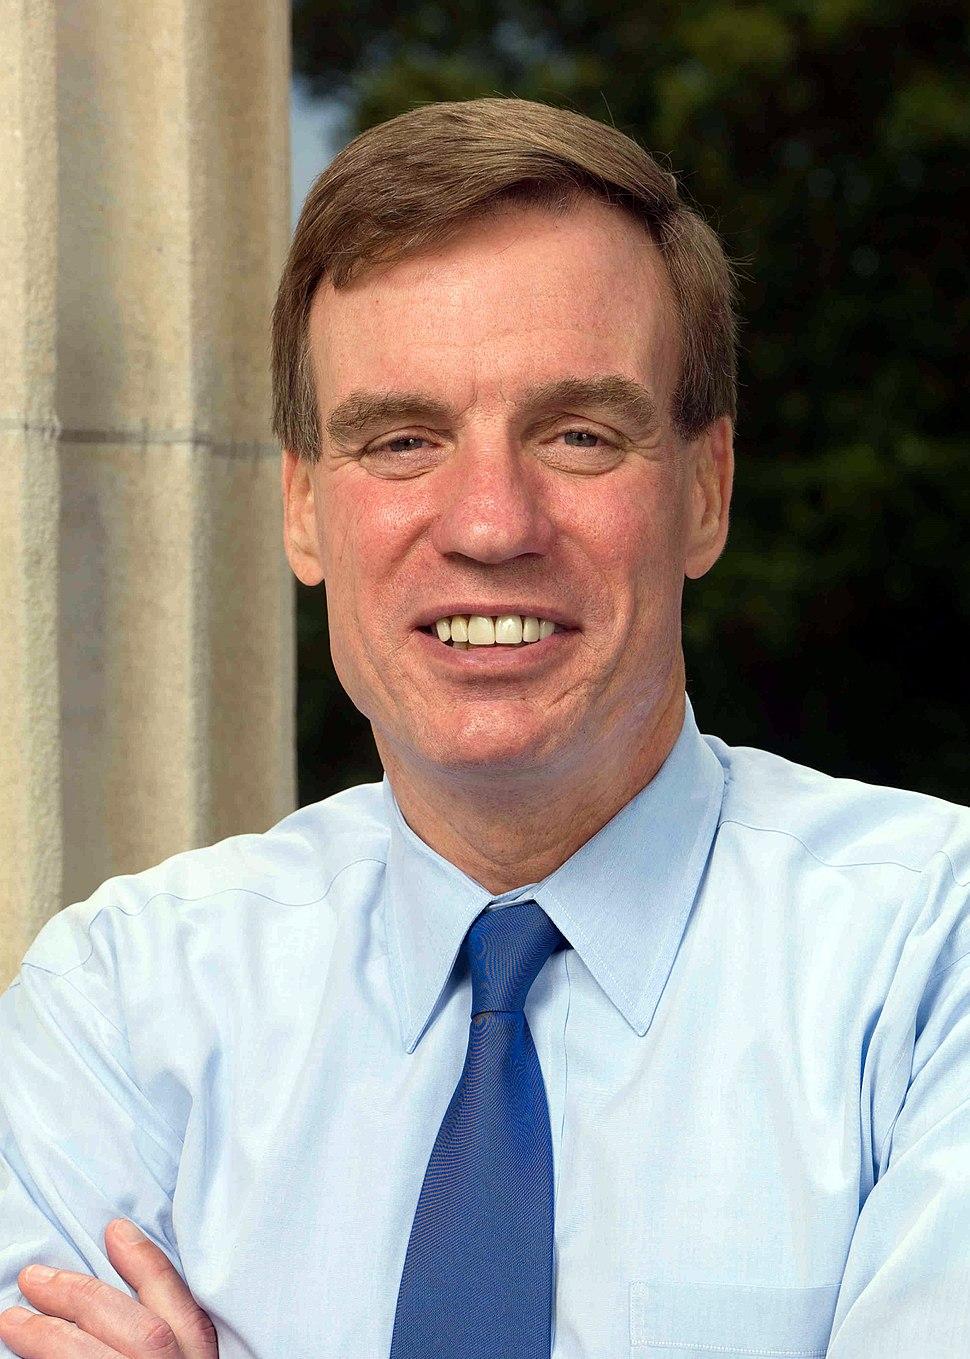 Mark Warner, official 112th Congress Senate portrait